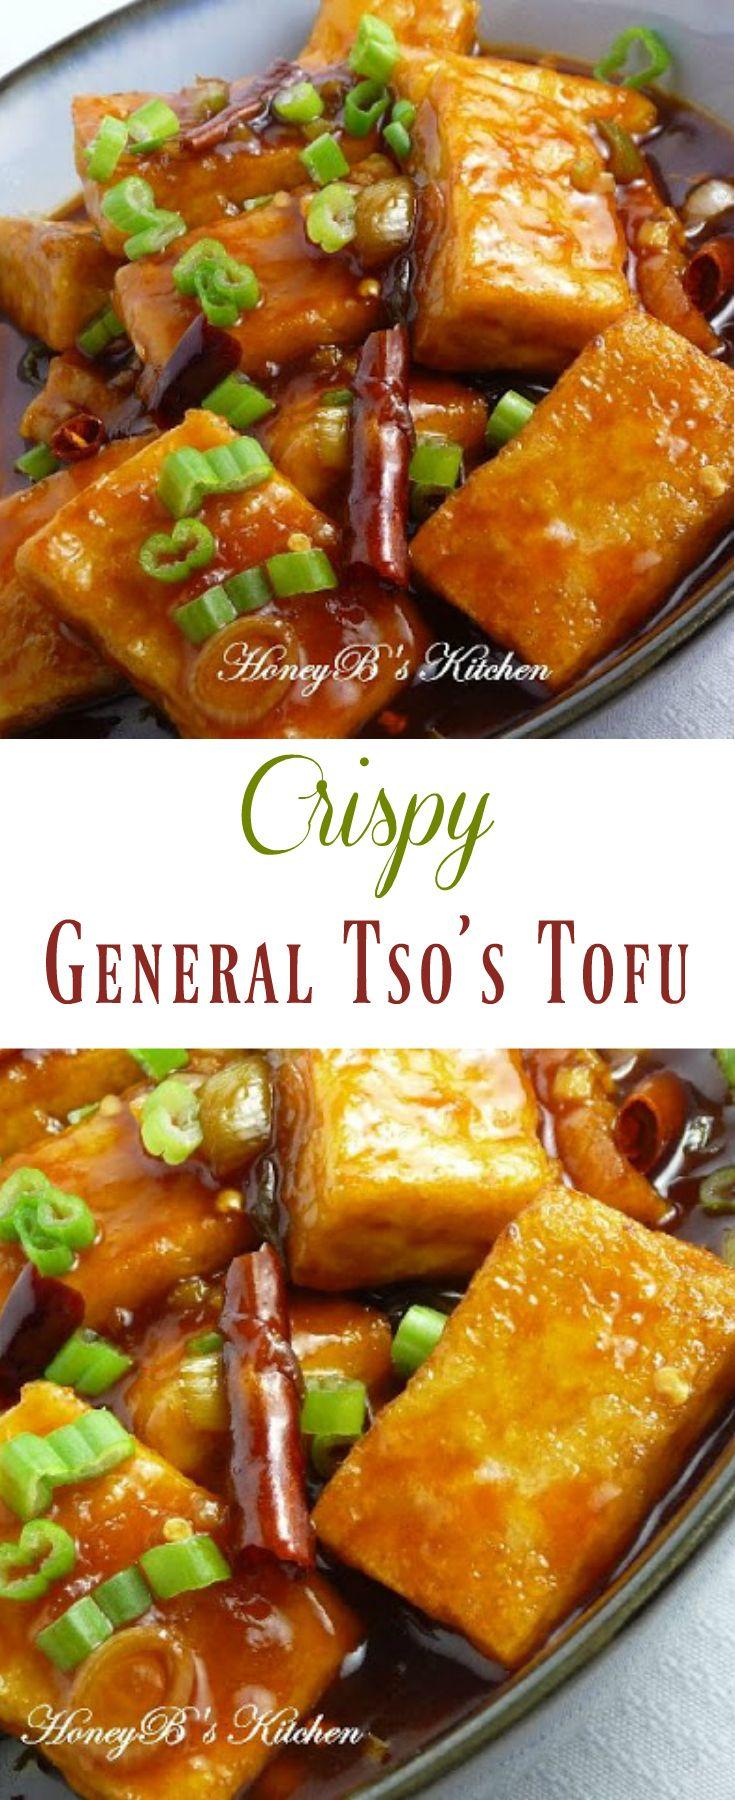 General Tso's Tofu                                                                                                                                                                                 More